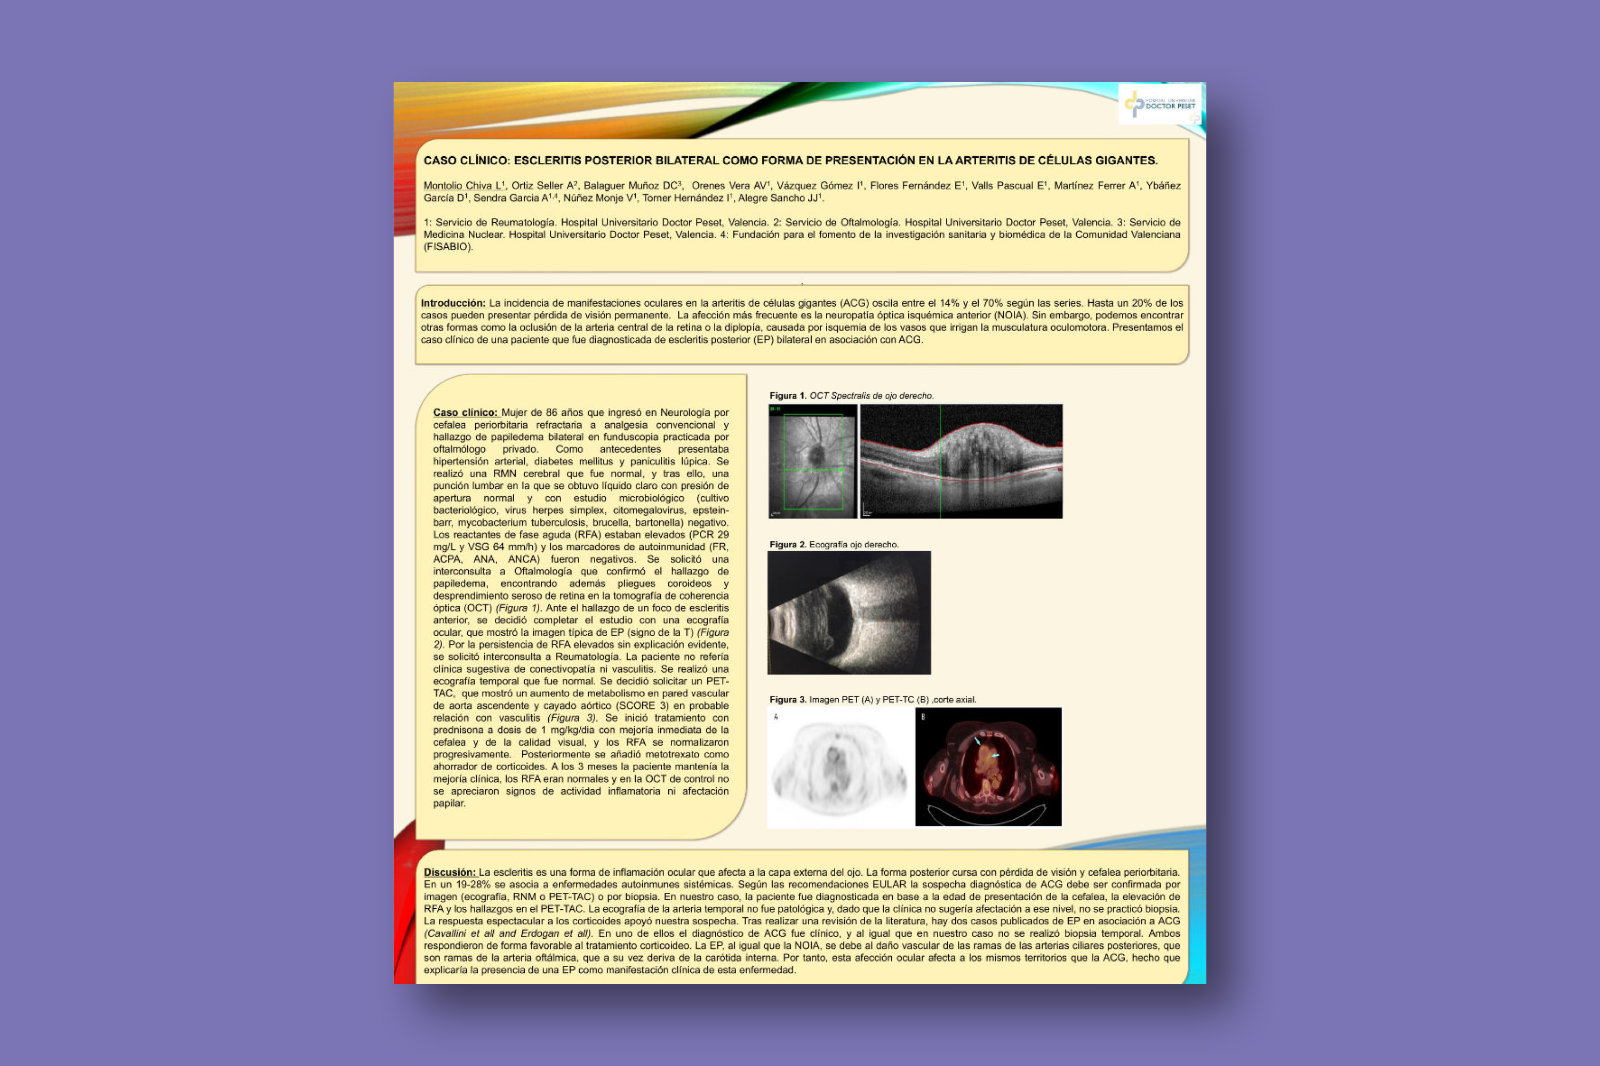 Caso clínico: escleritis posterior bilateral como forma de presentación en la arteritis de células gigantes